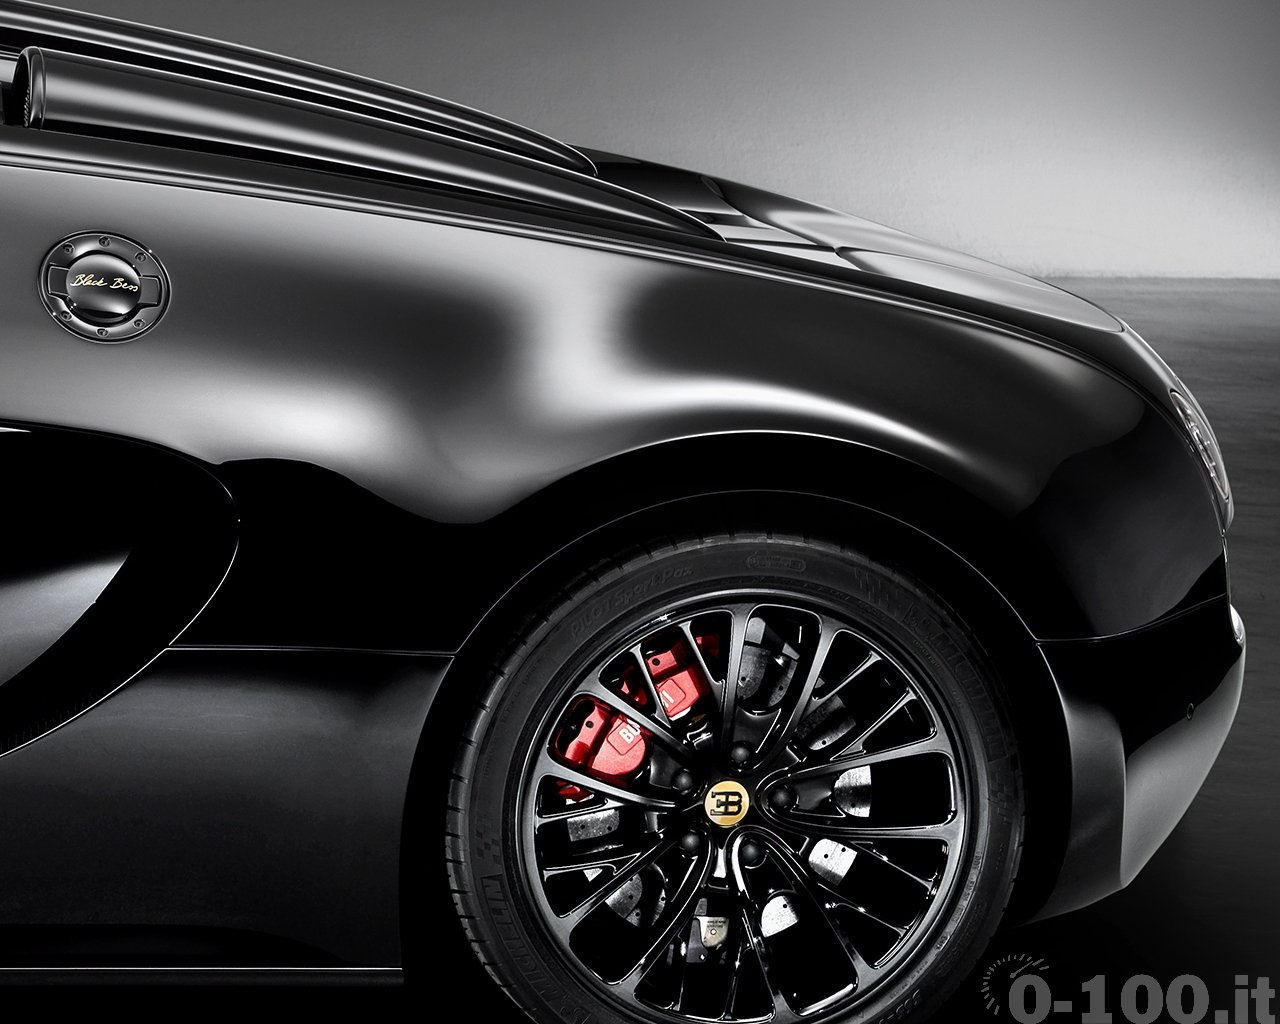 beijing-2014-bugatti-veyron-serie-speciale-les-legendes-de-bugatti-veyron-16-4-grand-sport-vitesse-black-bess_20